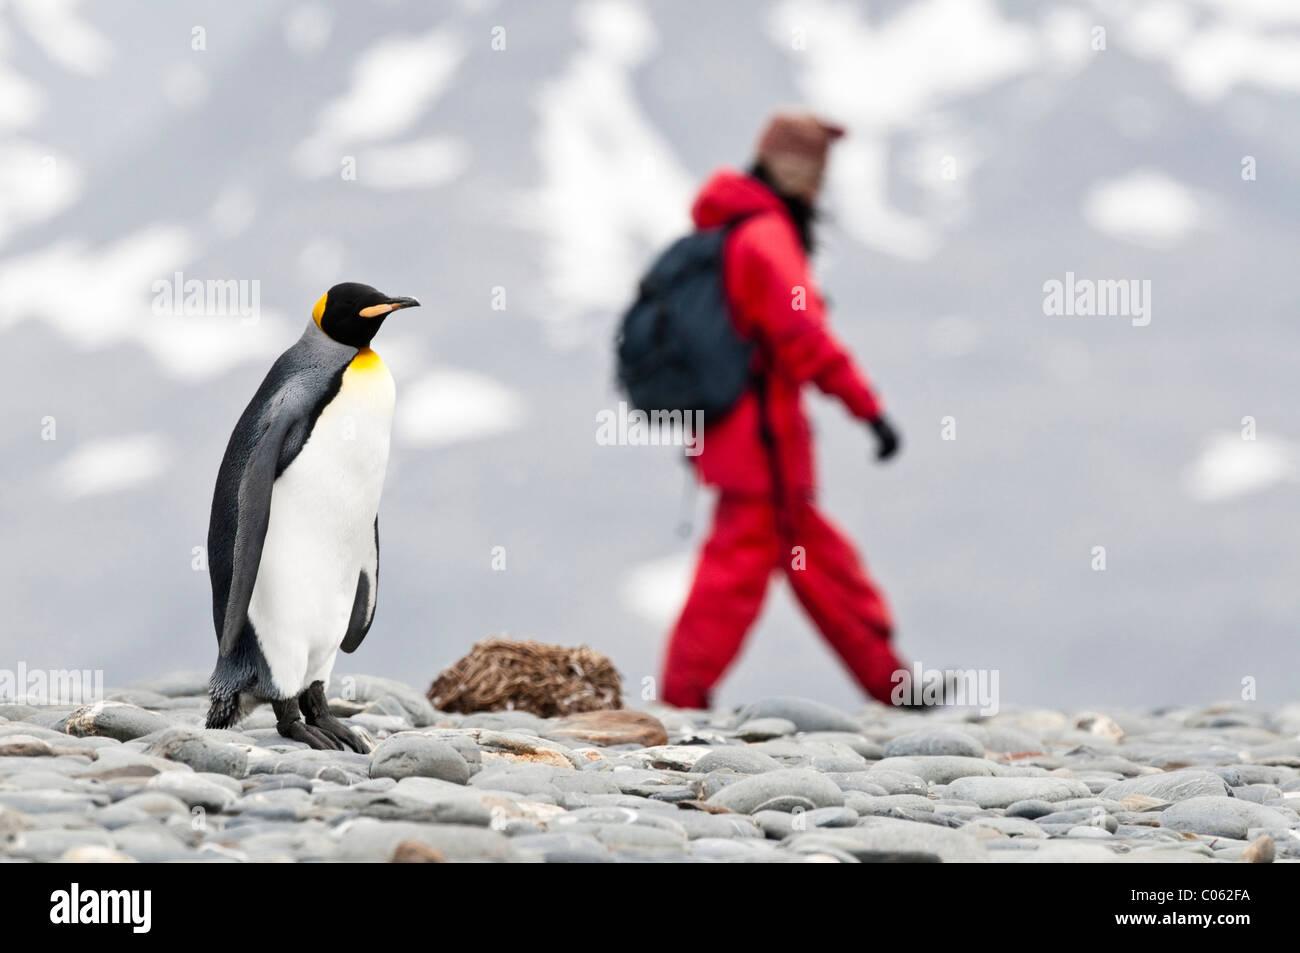 King Penguin with tourists on the beach at Salisbury Plain, South Georgia, South Atlantic - Stock Image